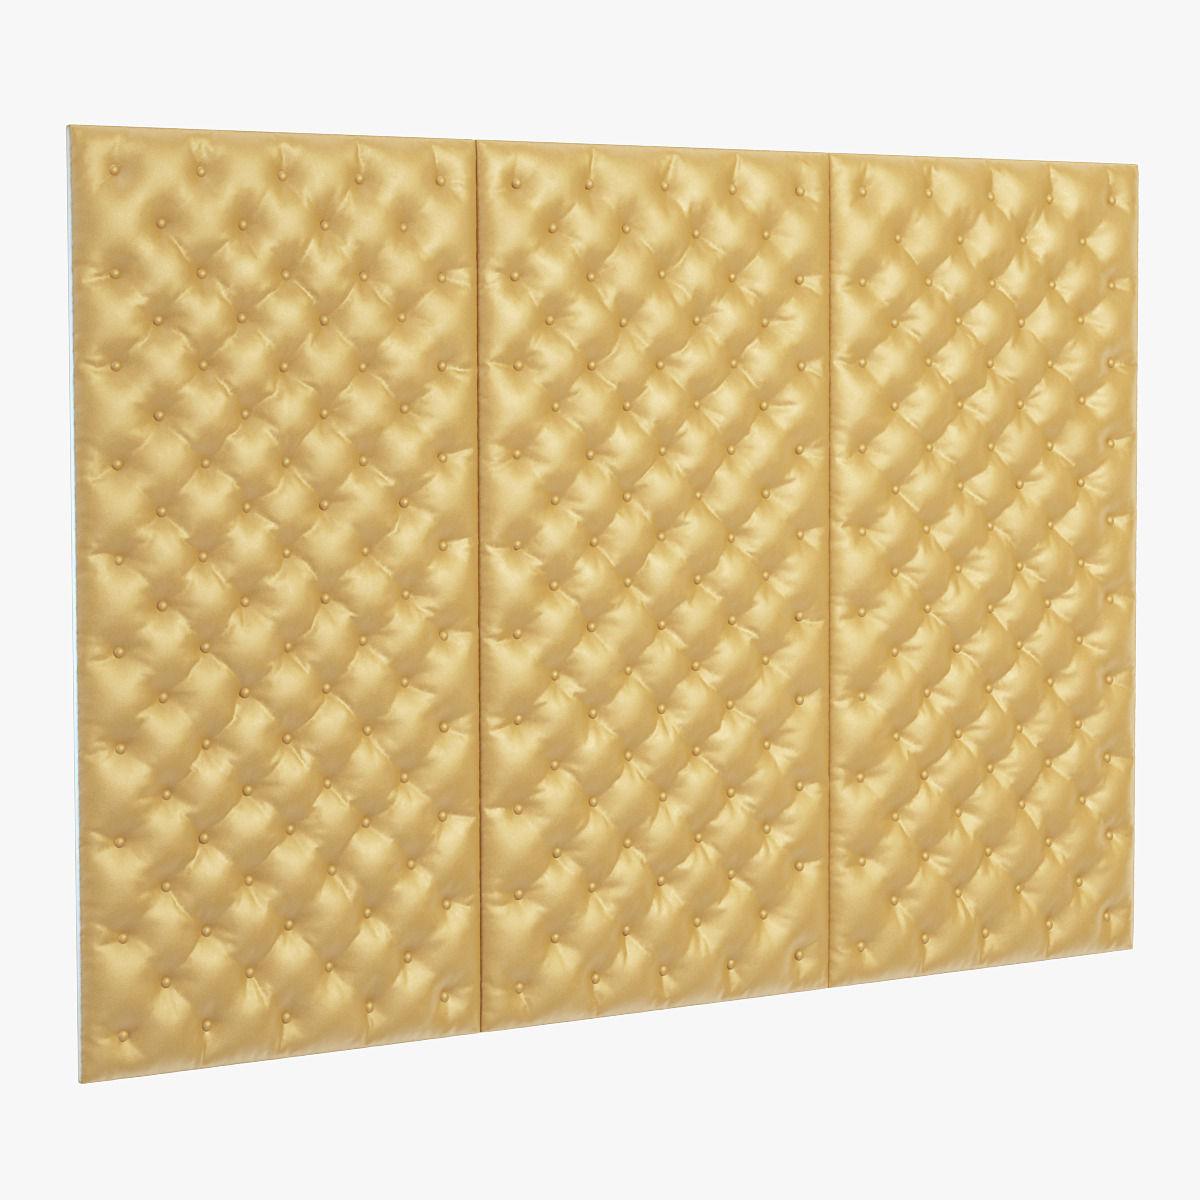 Decorative wall yellow panel 3D | CGTrader